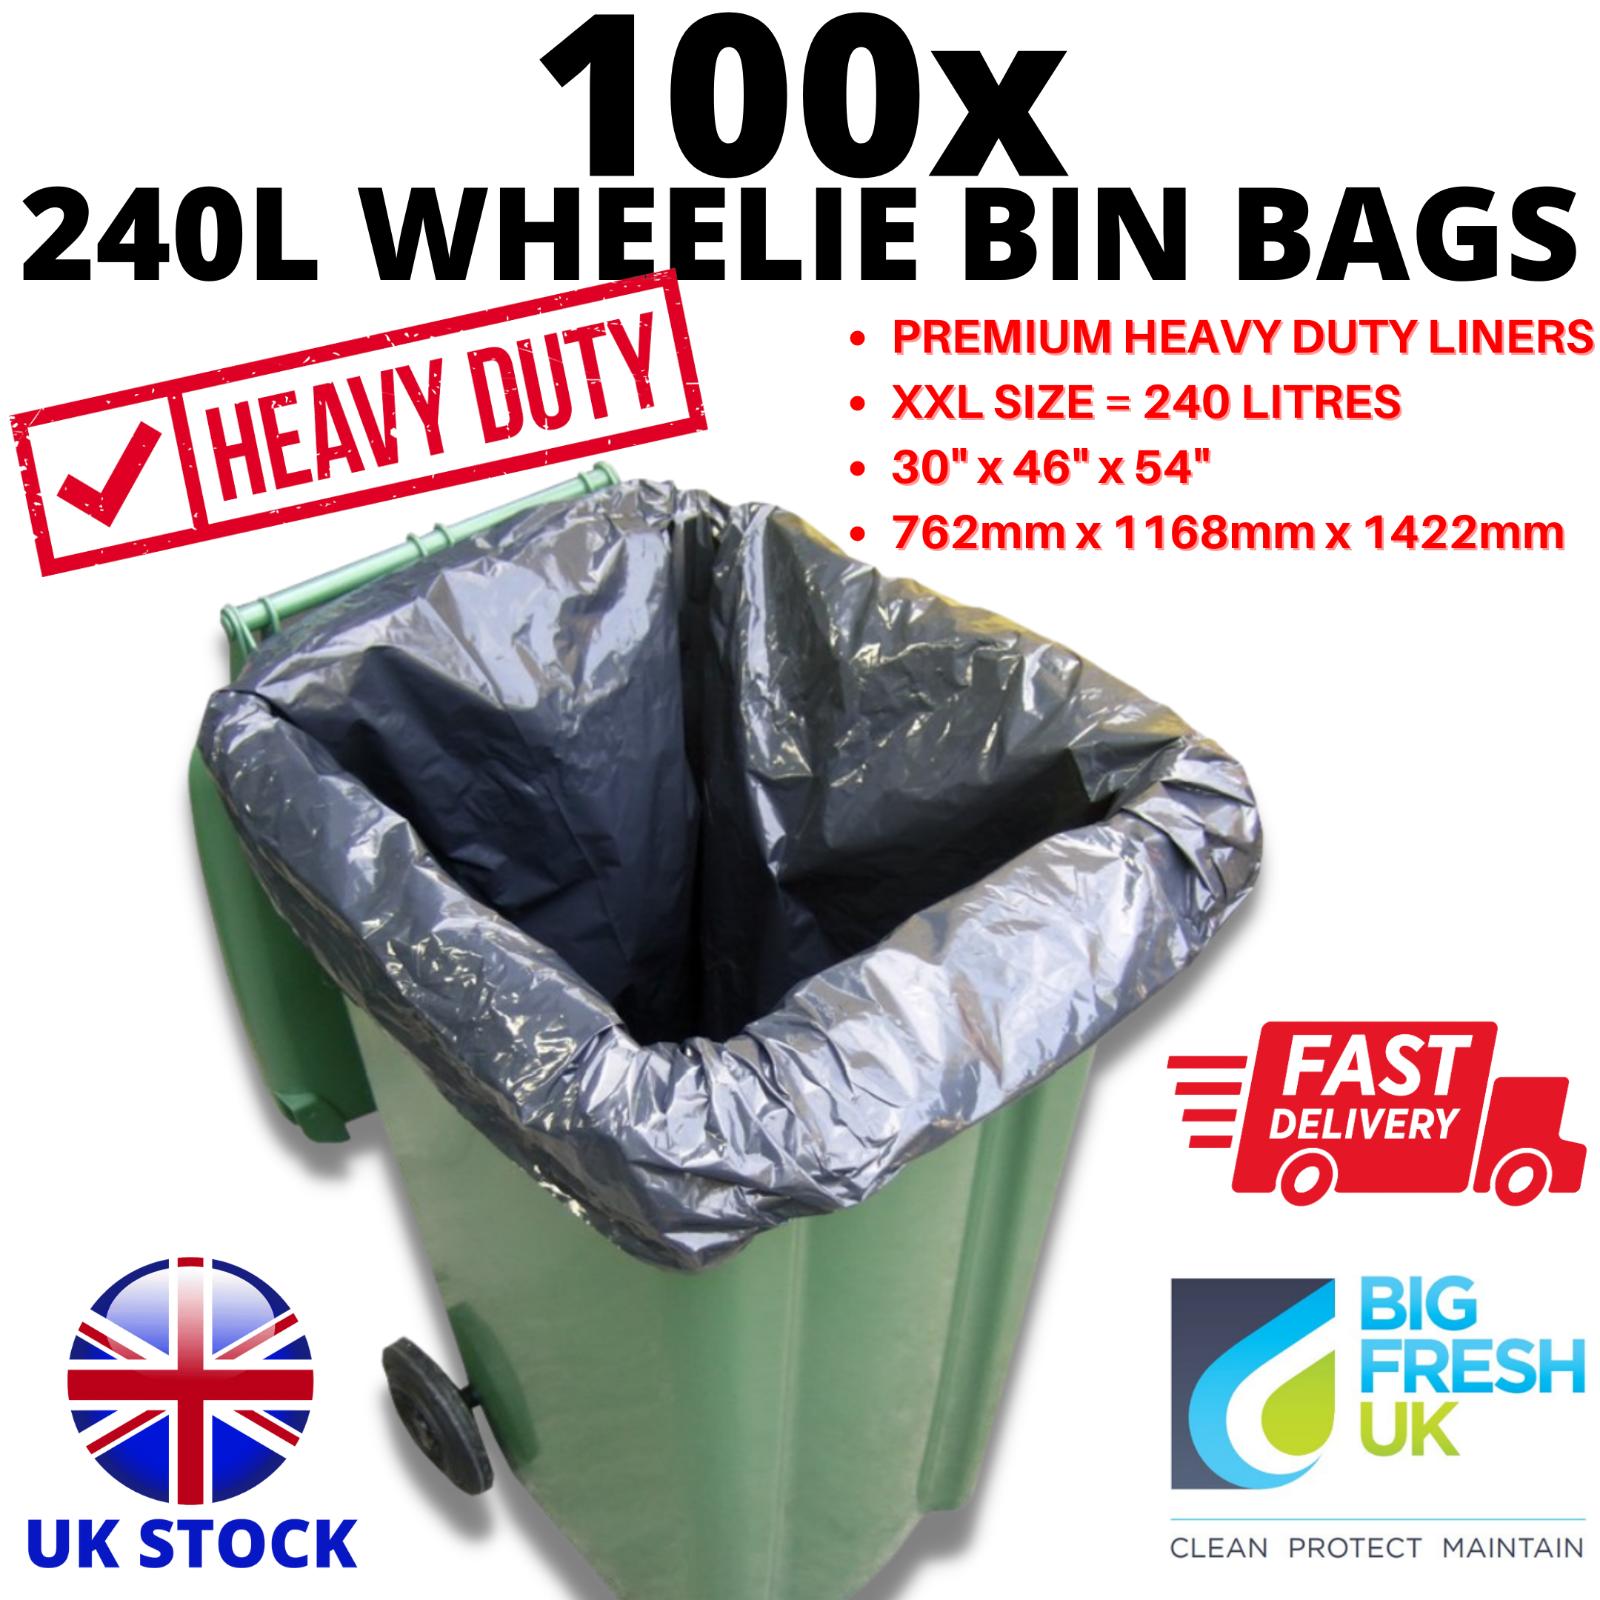 100 x WHEELIE BIN BAGS 240L - HEAVY DUTY THICK BAG LINERS 762mm x 1168mm x 1422m